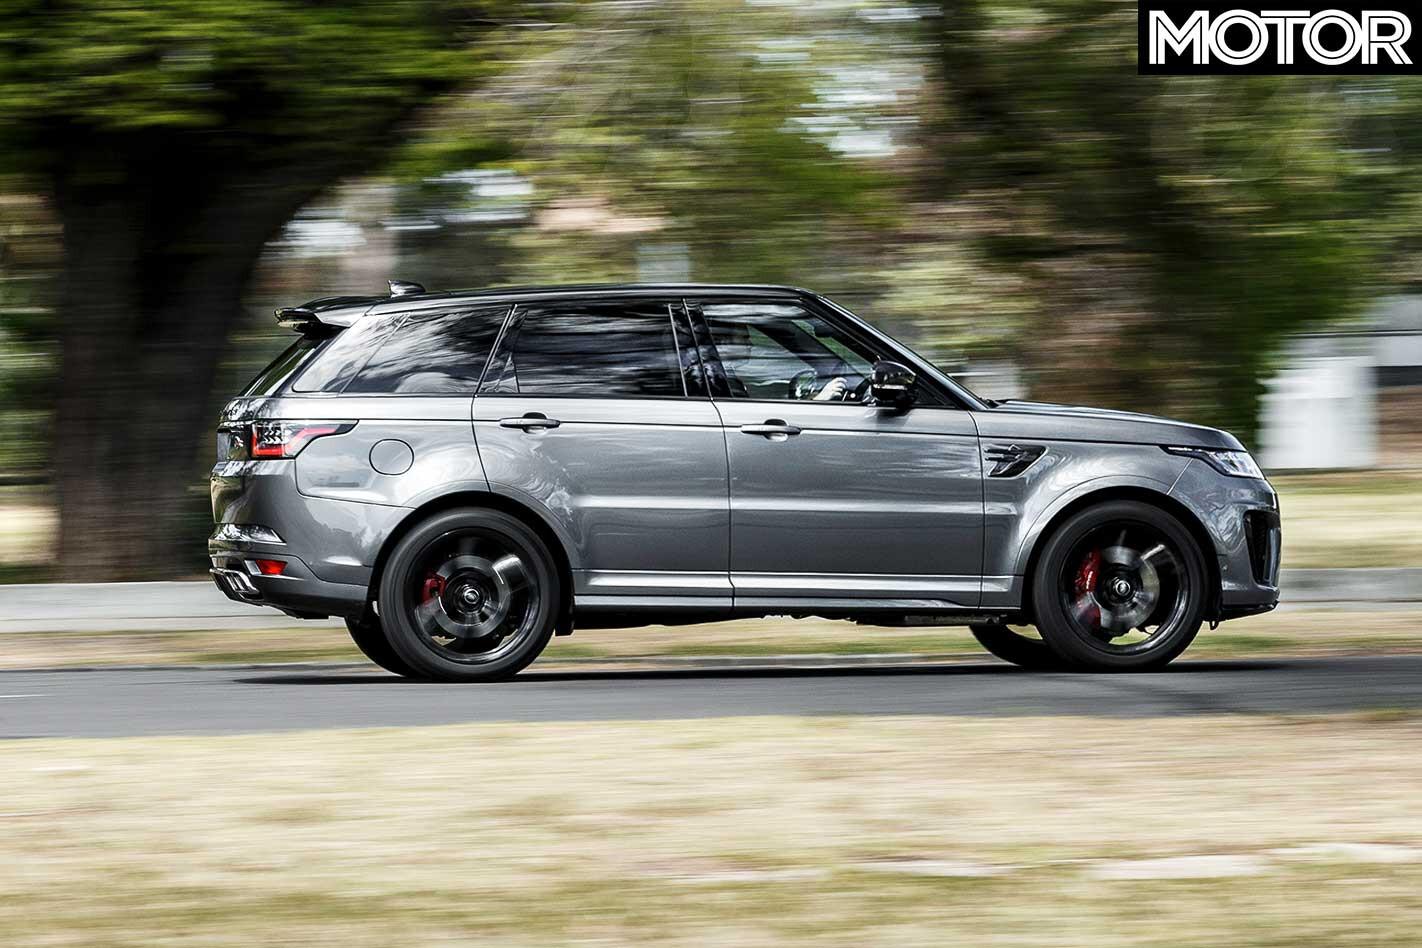 2019 Range Rover Sport SVR Side Profile Jpg